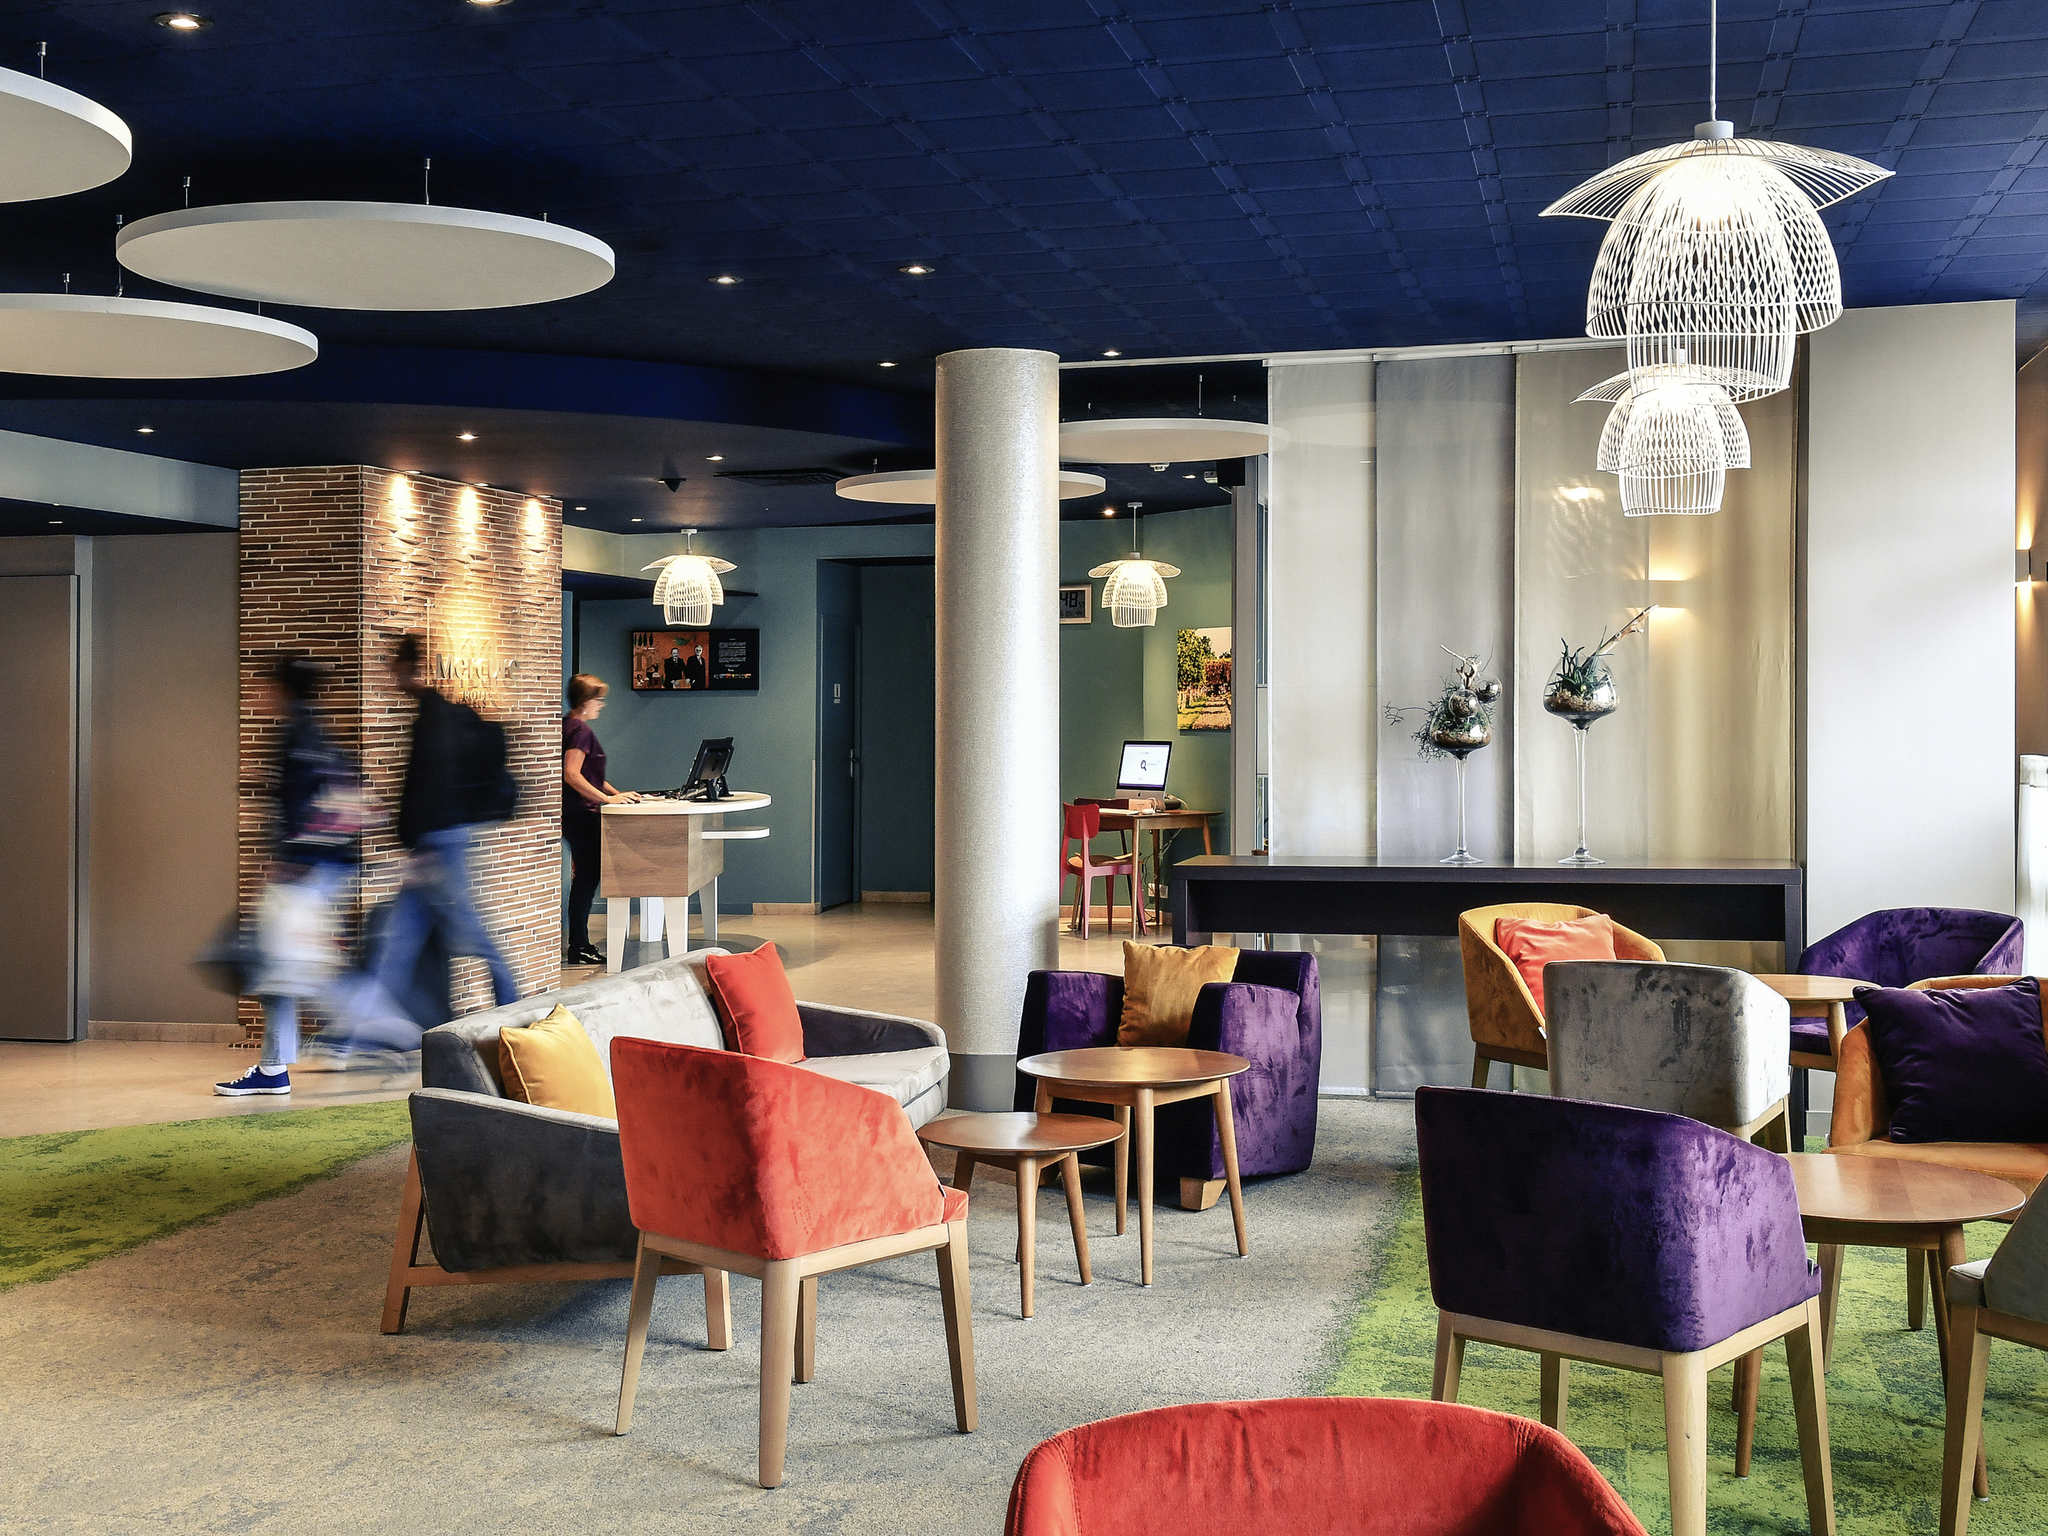 Hotel – Mercure Trouville sur Mer hotel